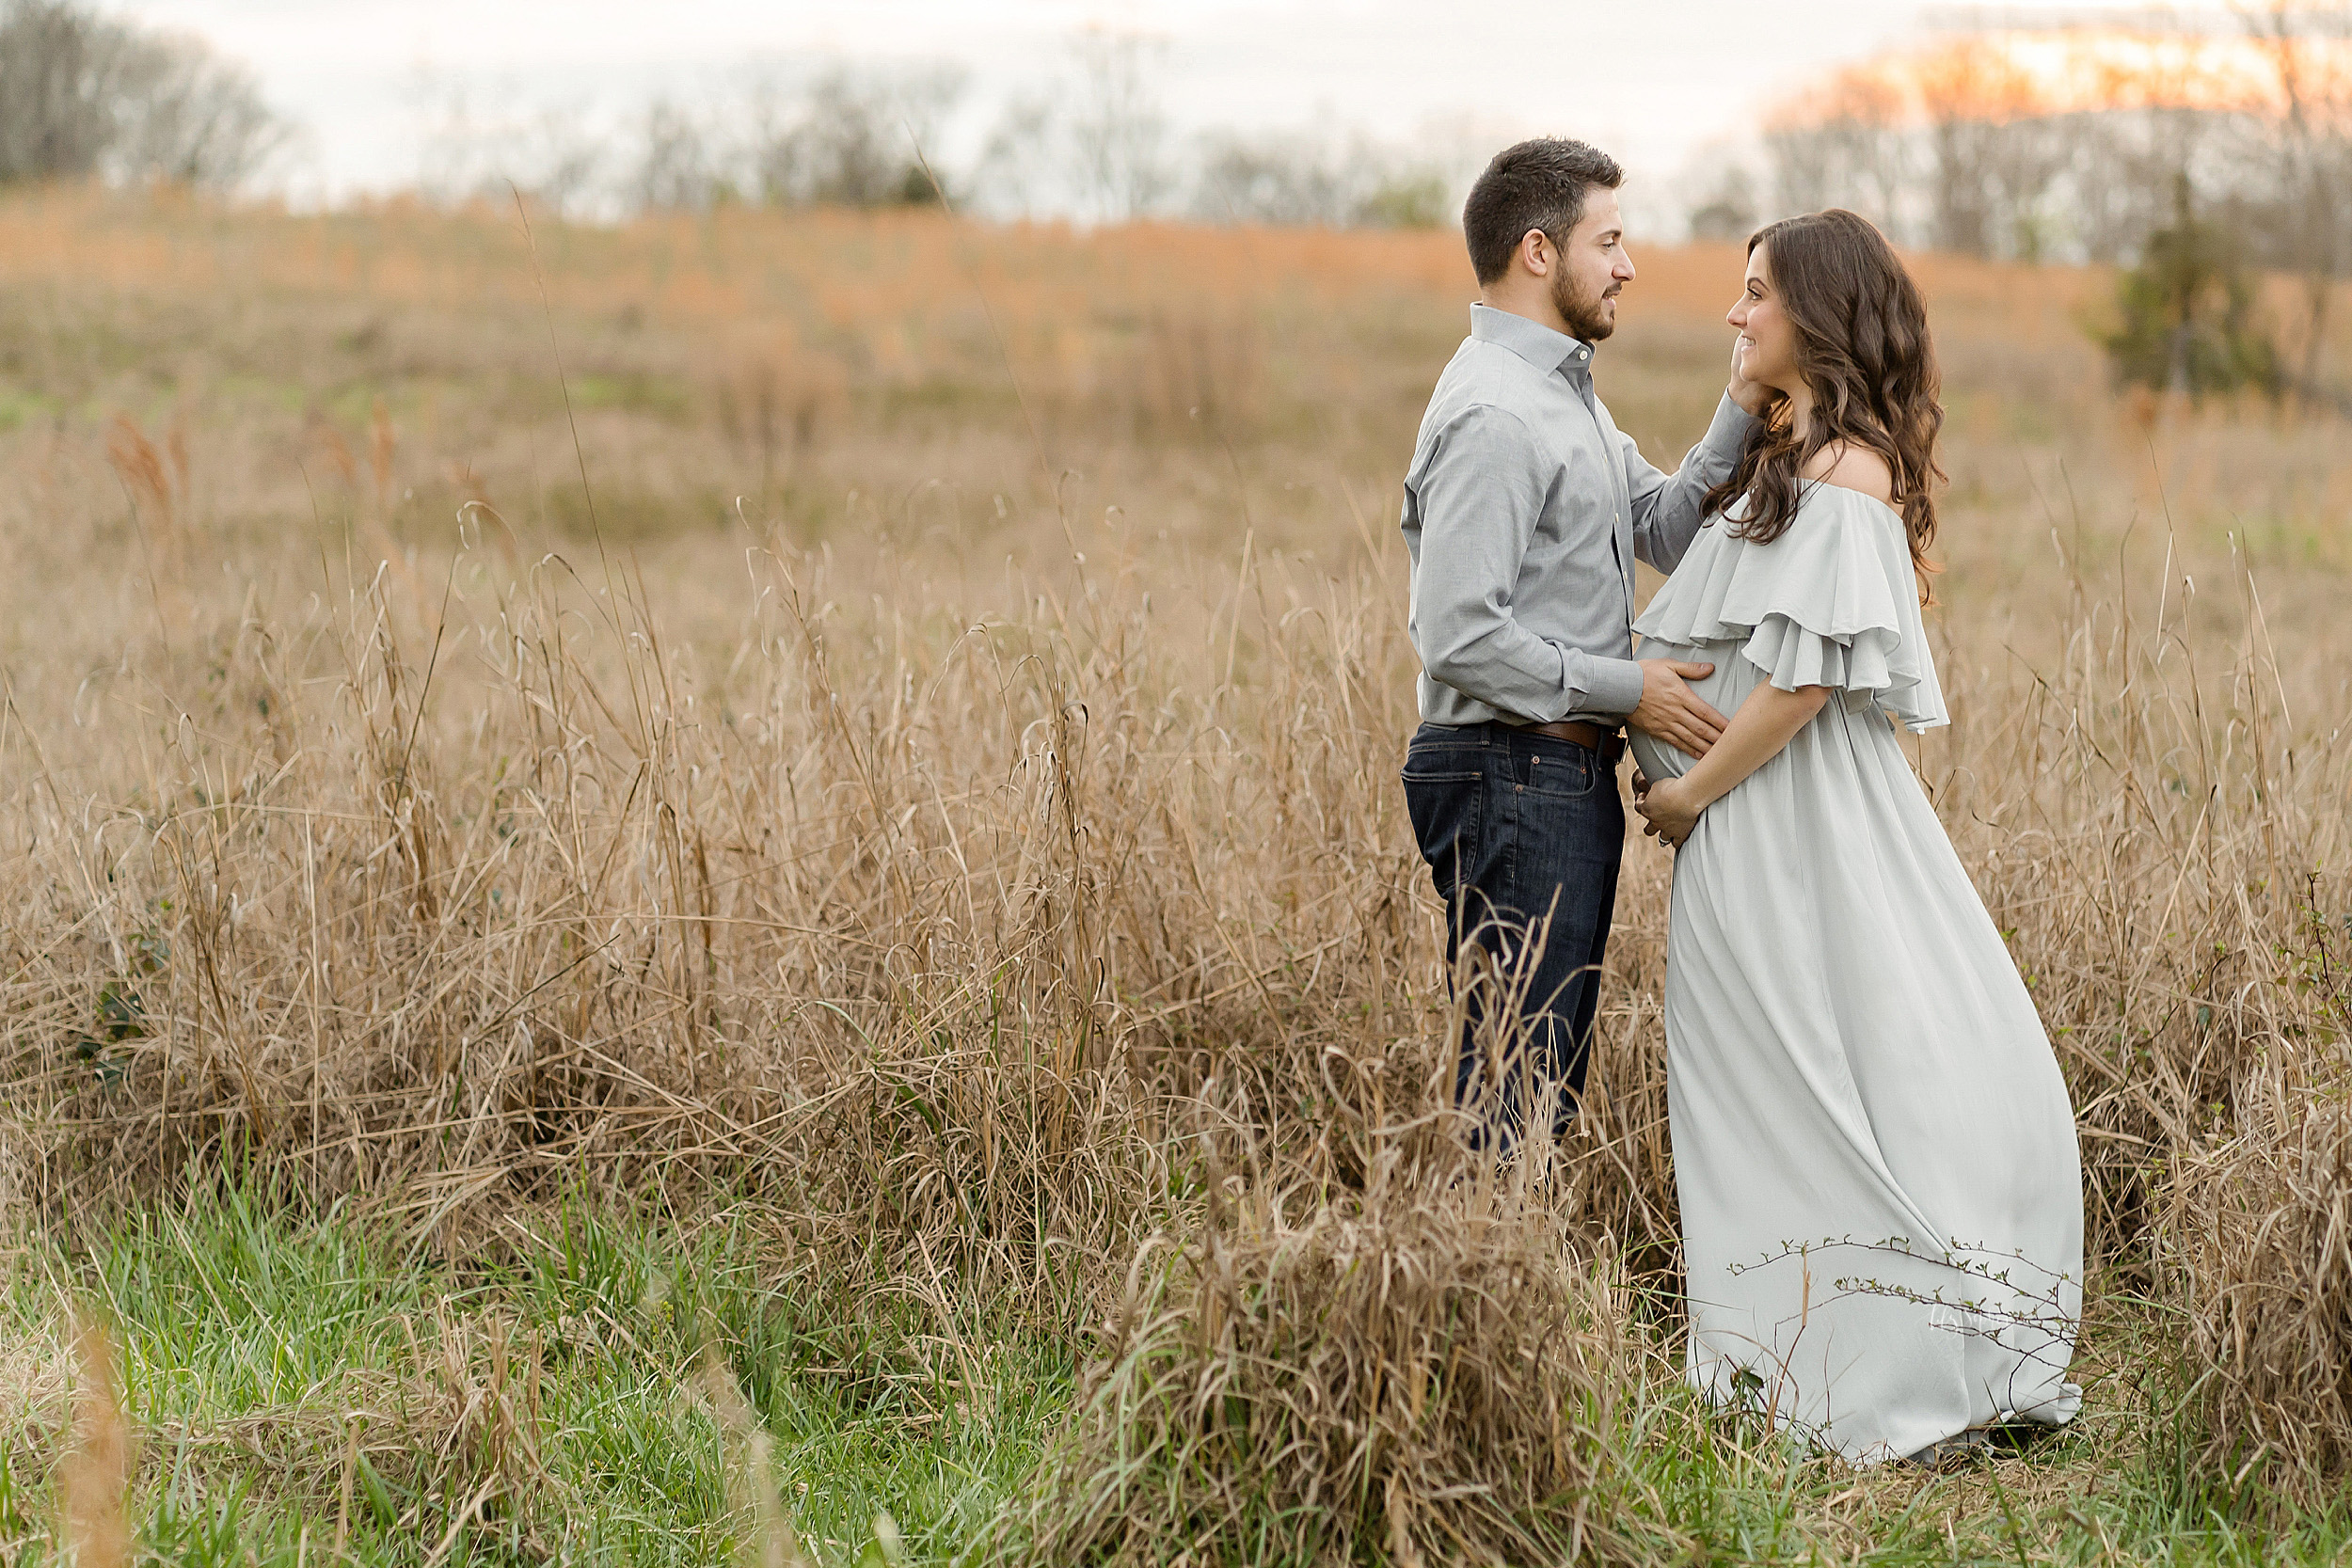 atlanta-brookhaven-alpharetta-sandy-springs-buckhead-virginia-highlands-west-end-decatur-lily-sophia-photography-outdoor-field-sunset-couples-maternity-photos-expecting-baby-girl_1096.jpg